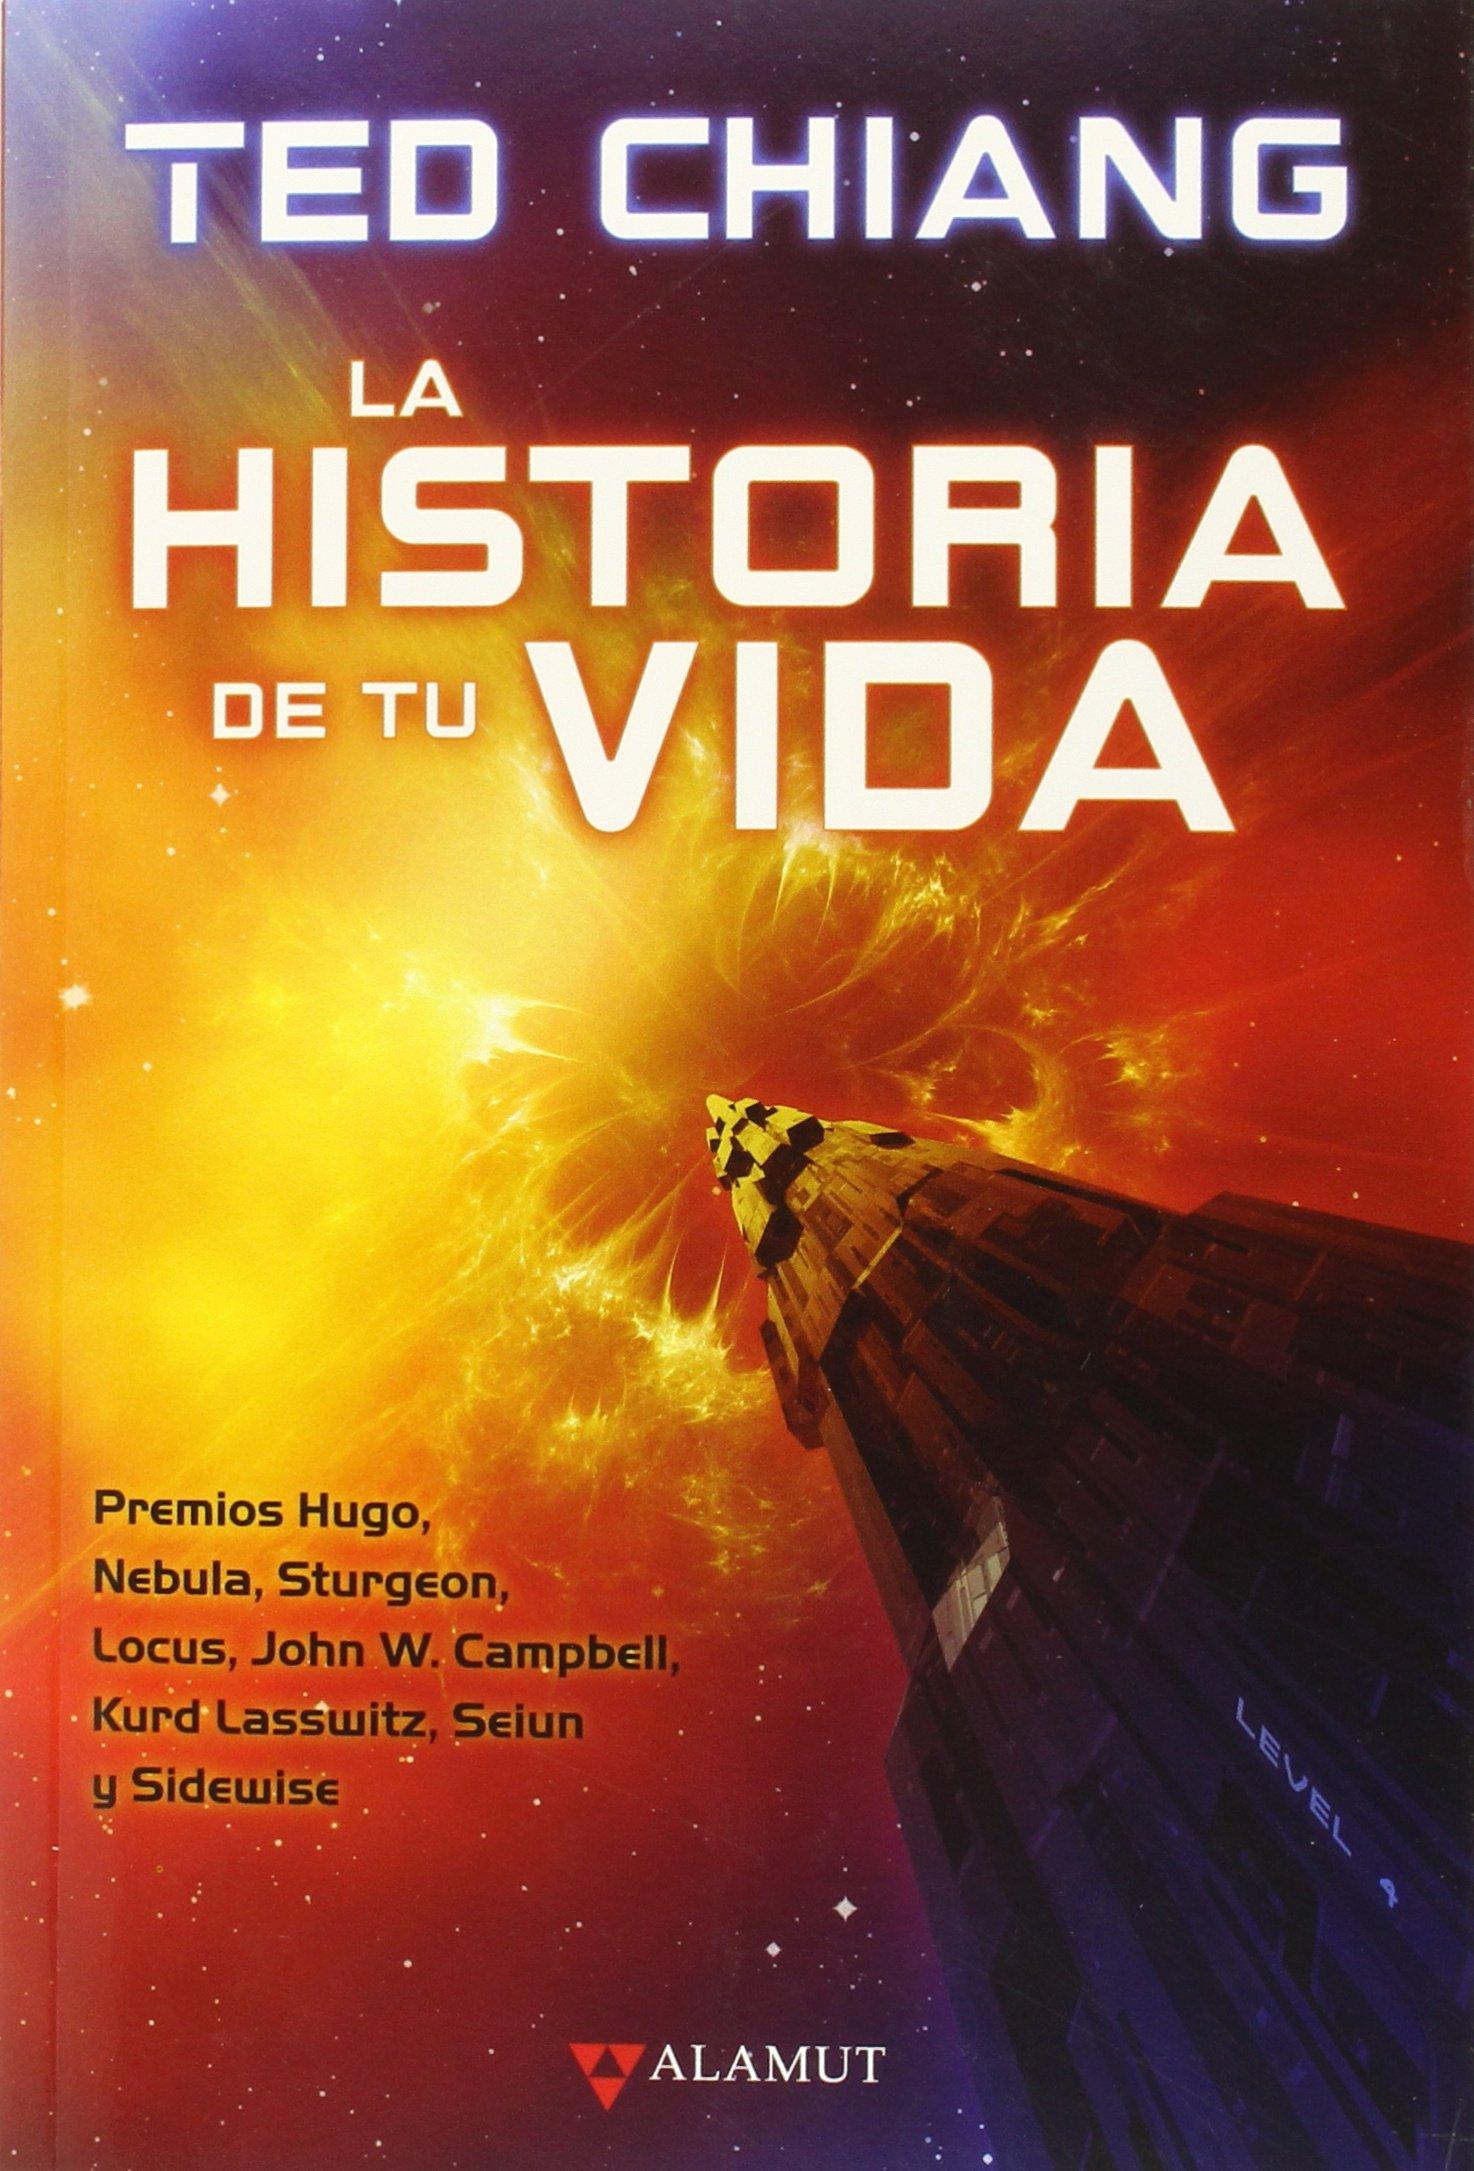 Historia de tu vida, La (Alamut Serie Fantástica): Amazon.es ...